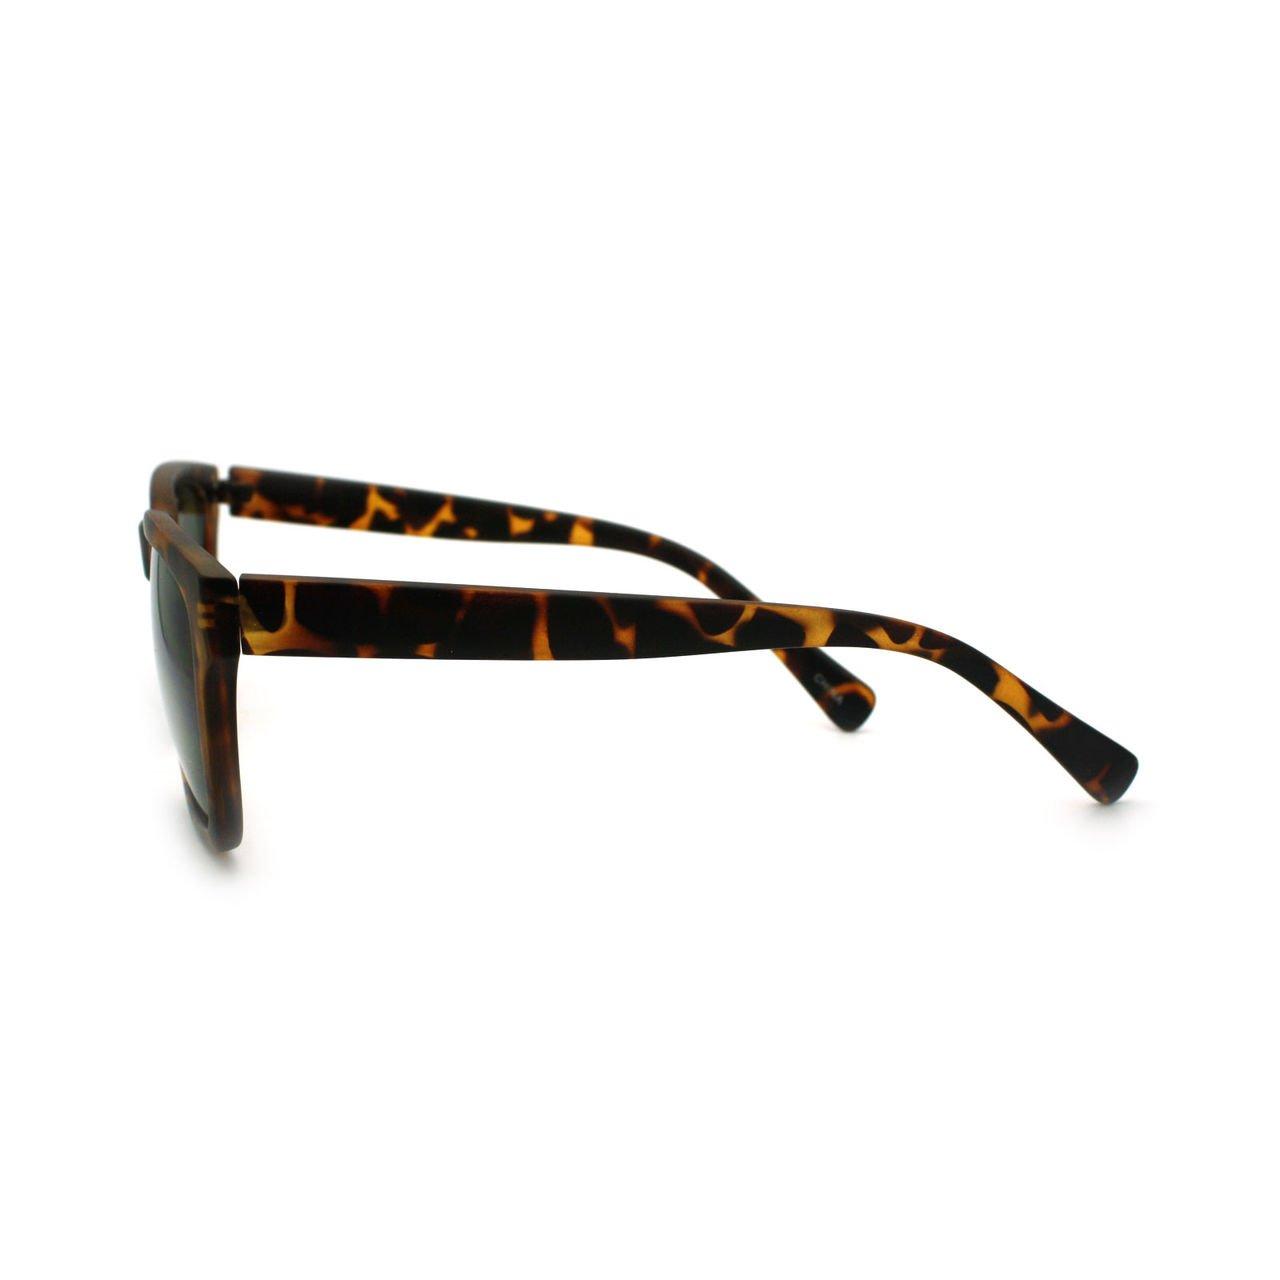 Hip Retro Modern Unisex Sunglasses Square Rectangular Frame